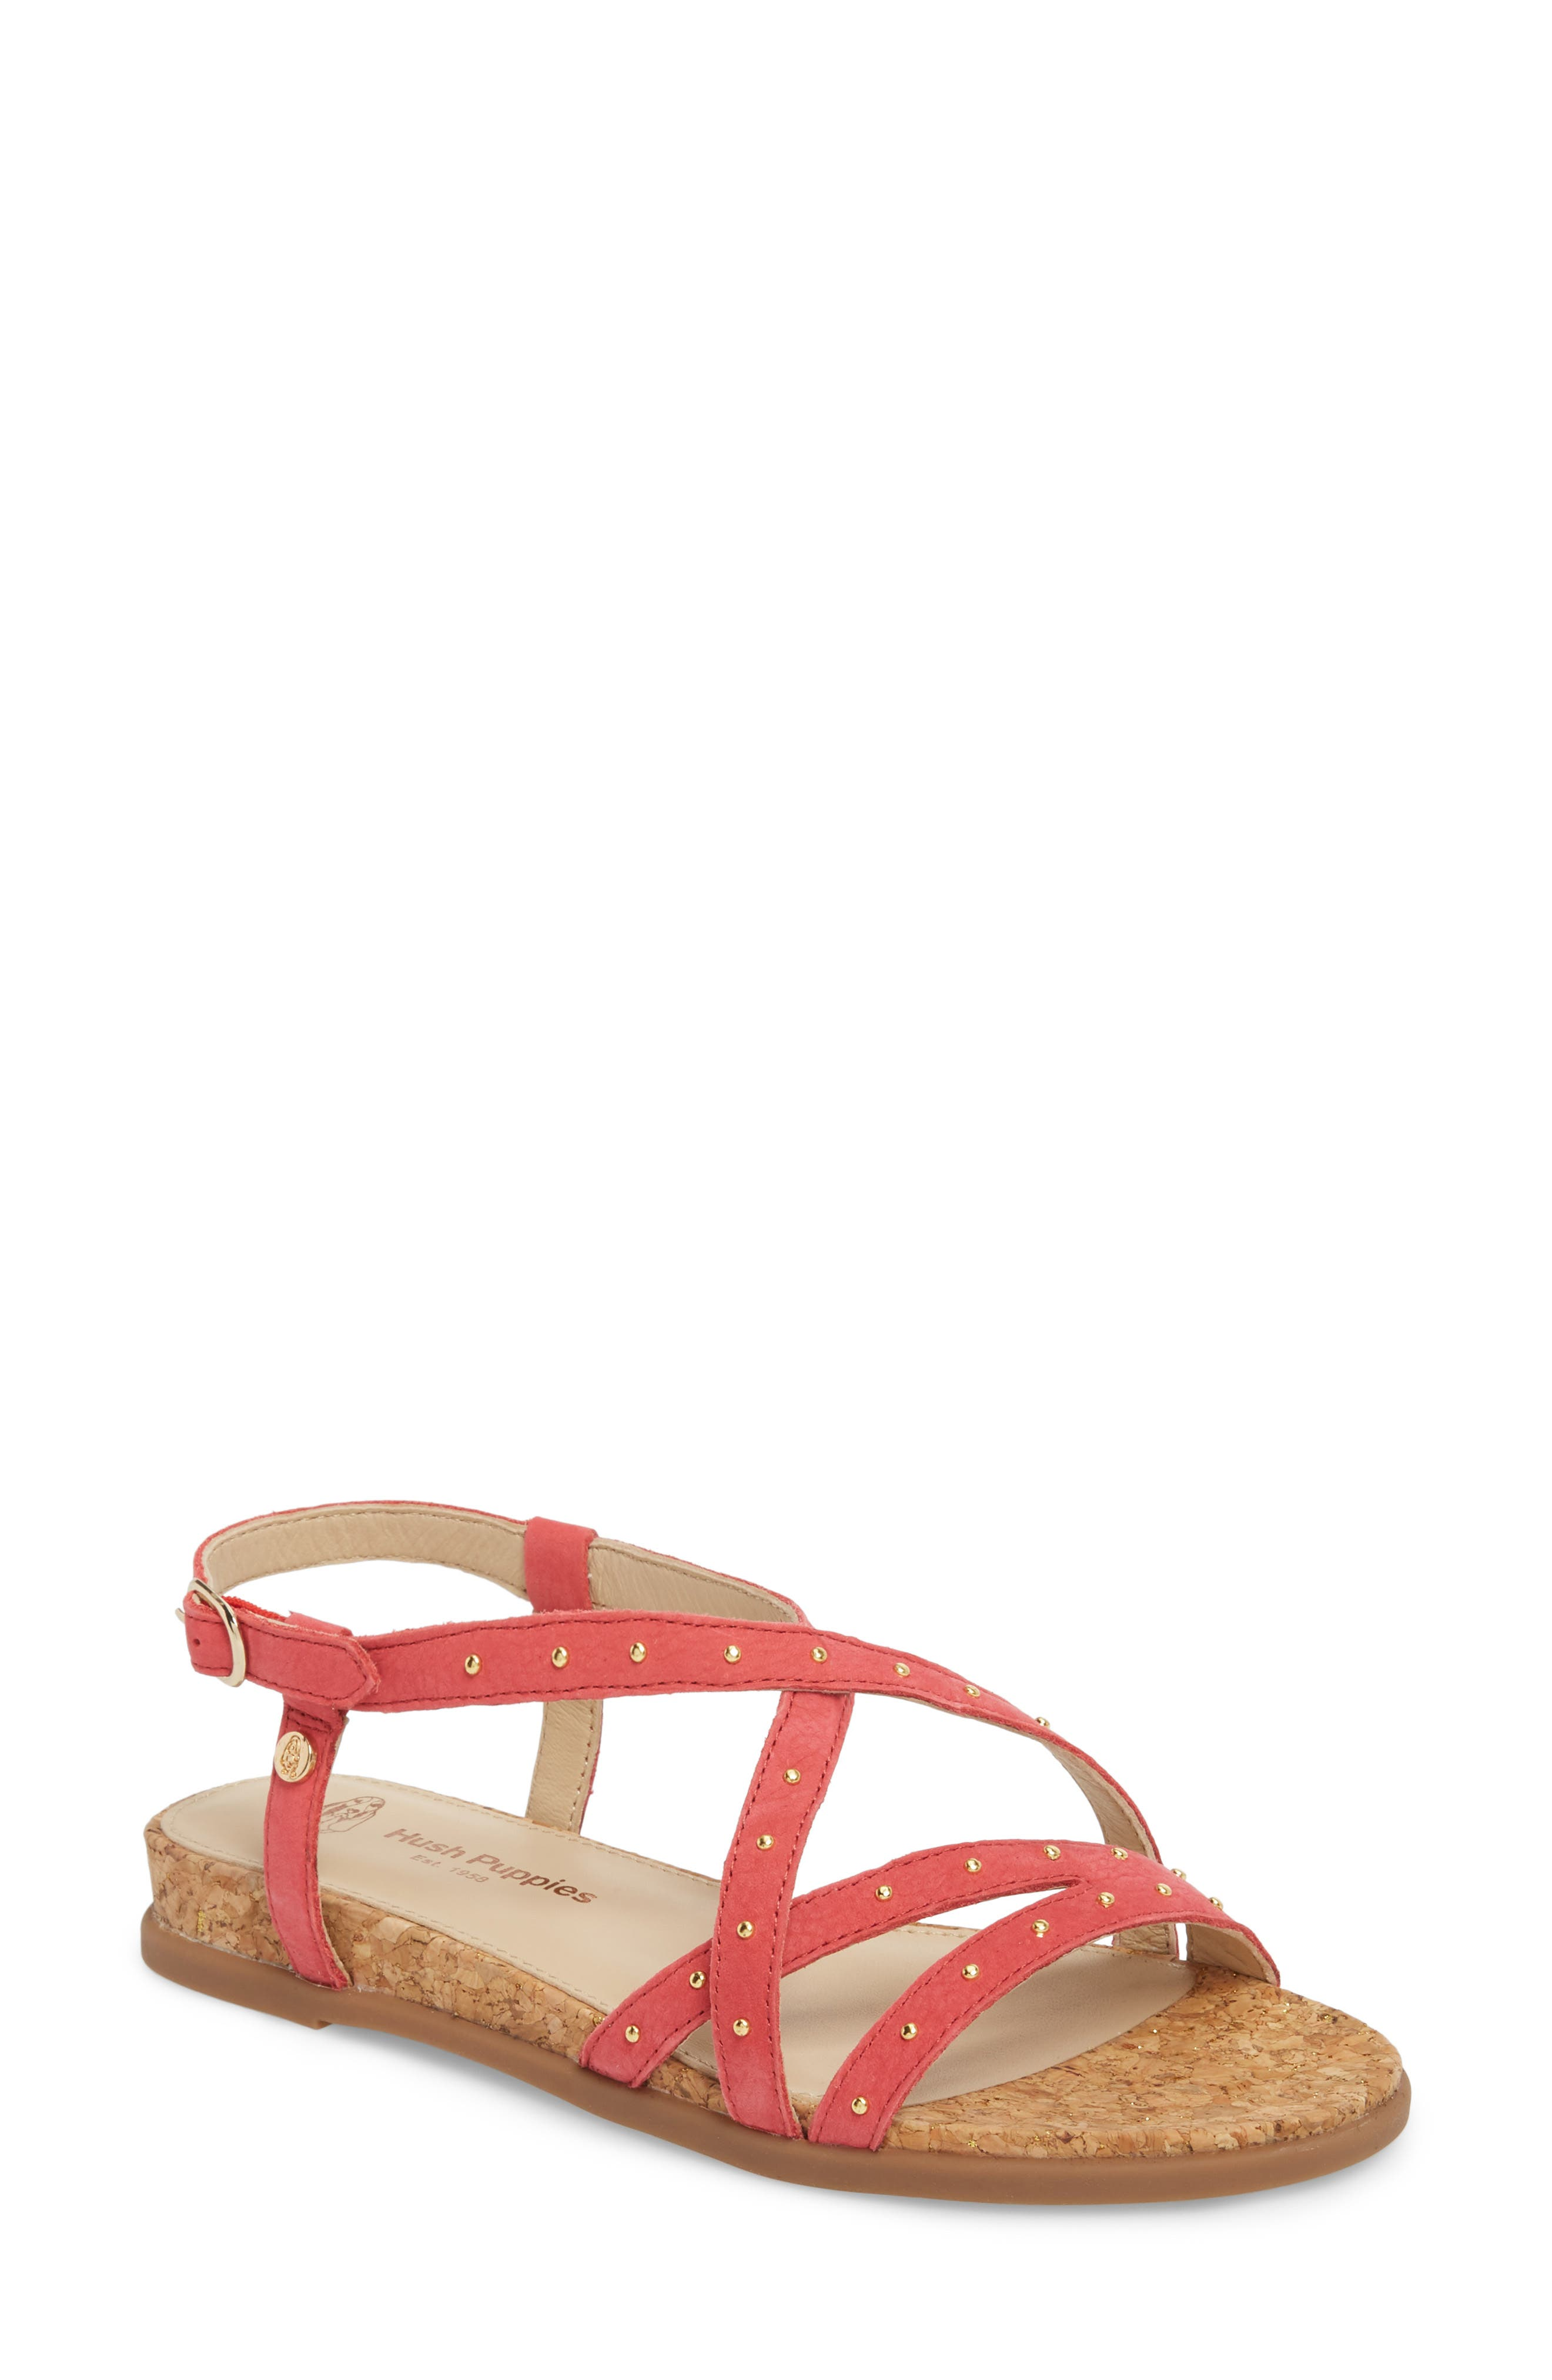 Dalmatian Studded Sandal,                             Main thumbnail 3, color,